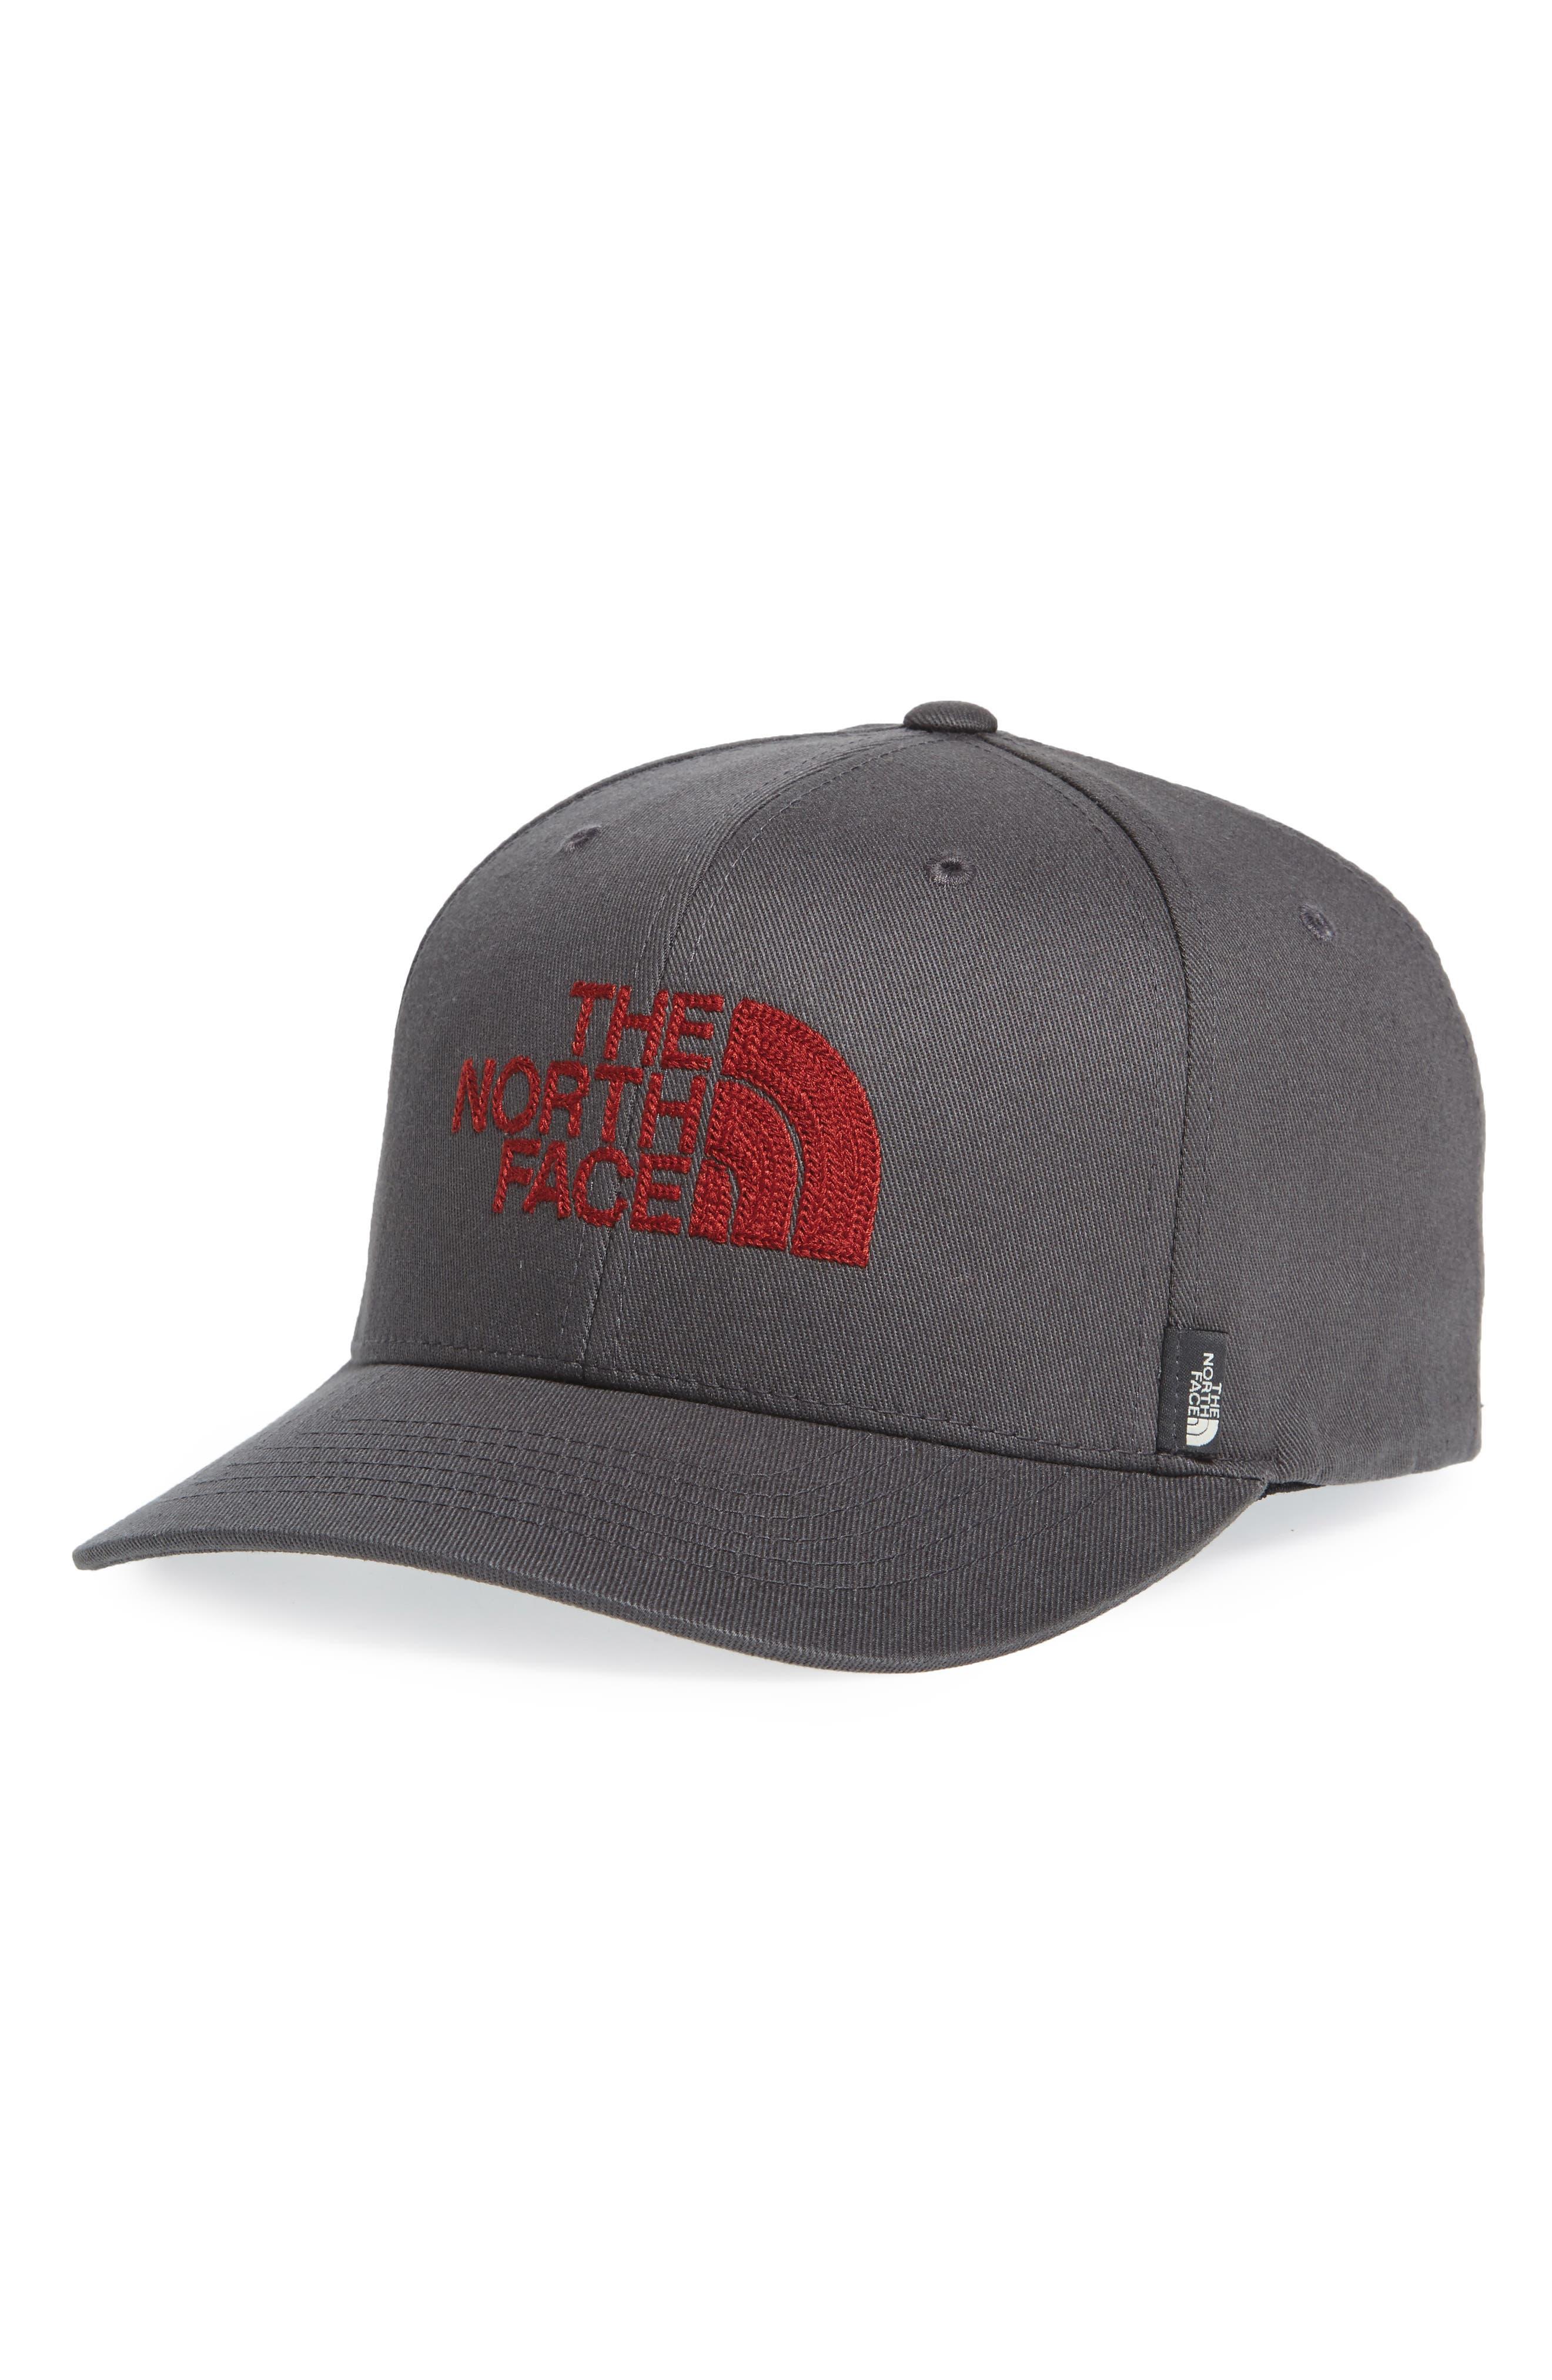 Never Stop Exploring Baseball Cap,                         Main,                         color, Asphalt Grey